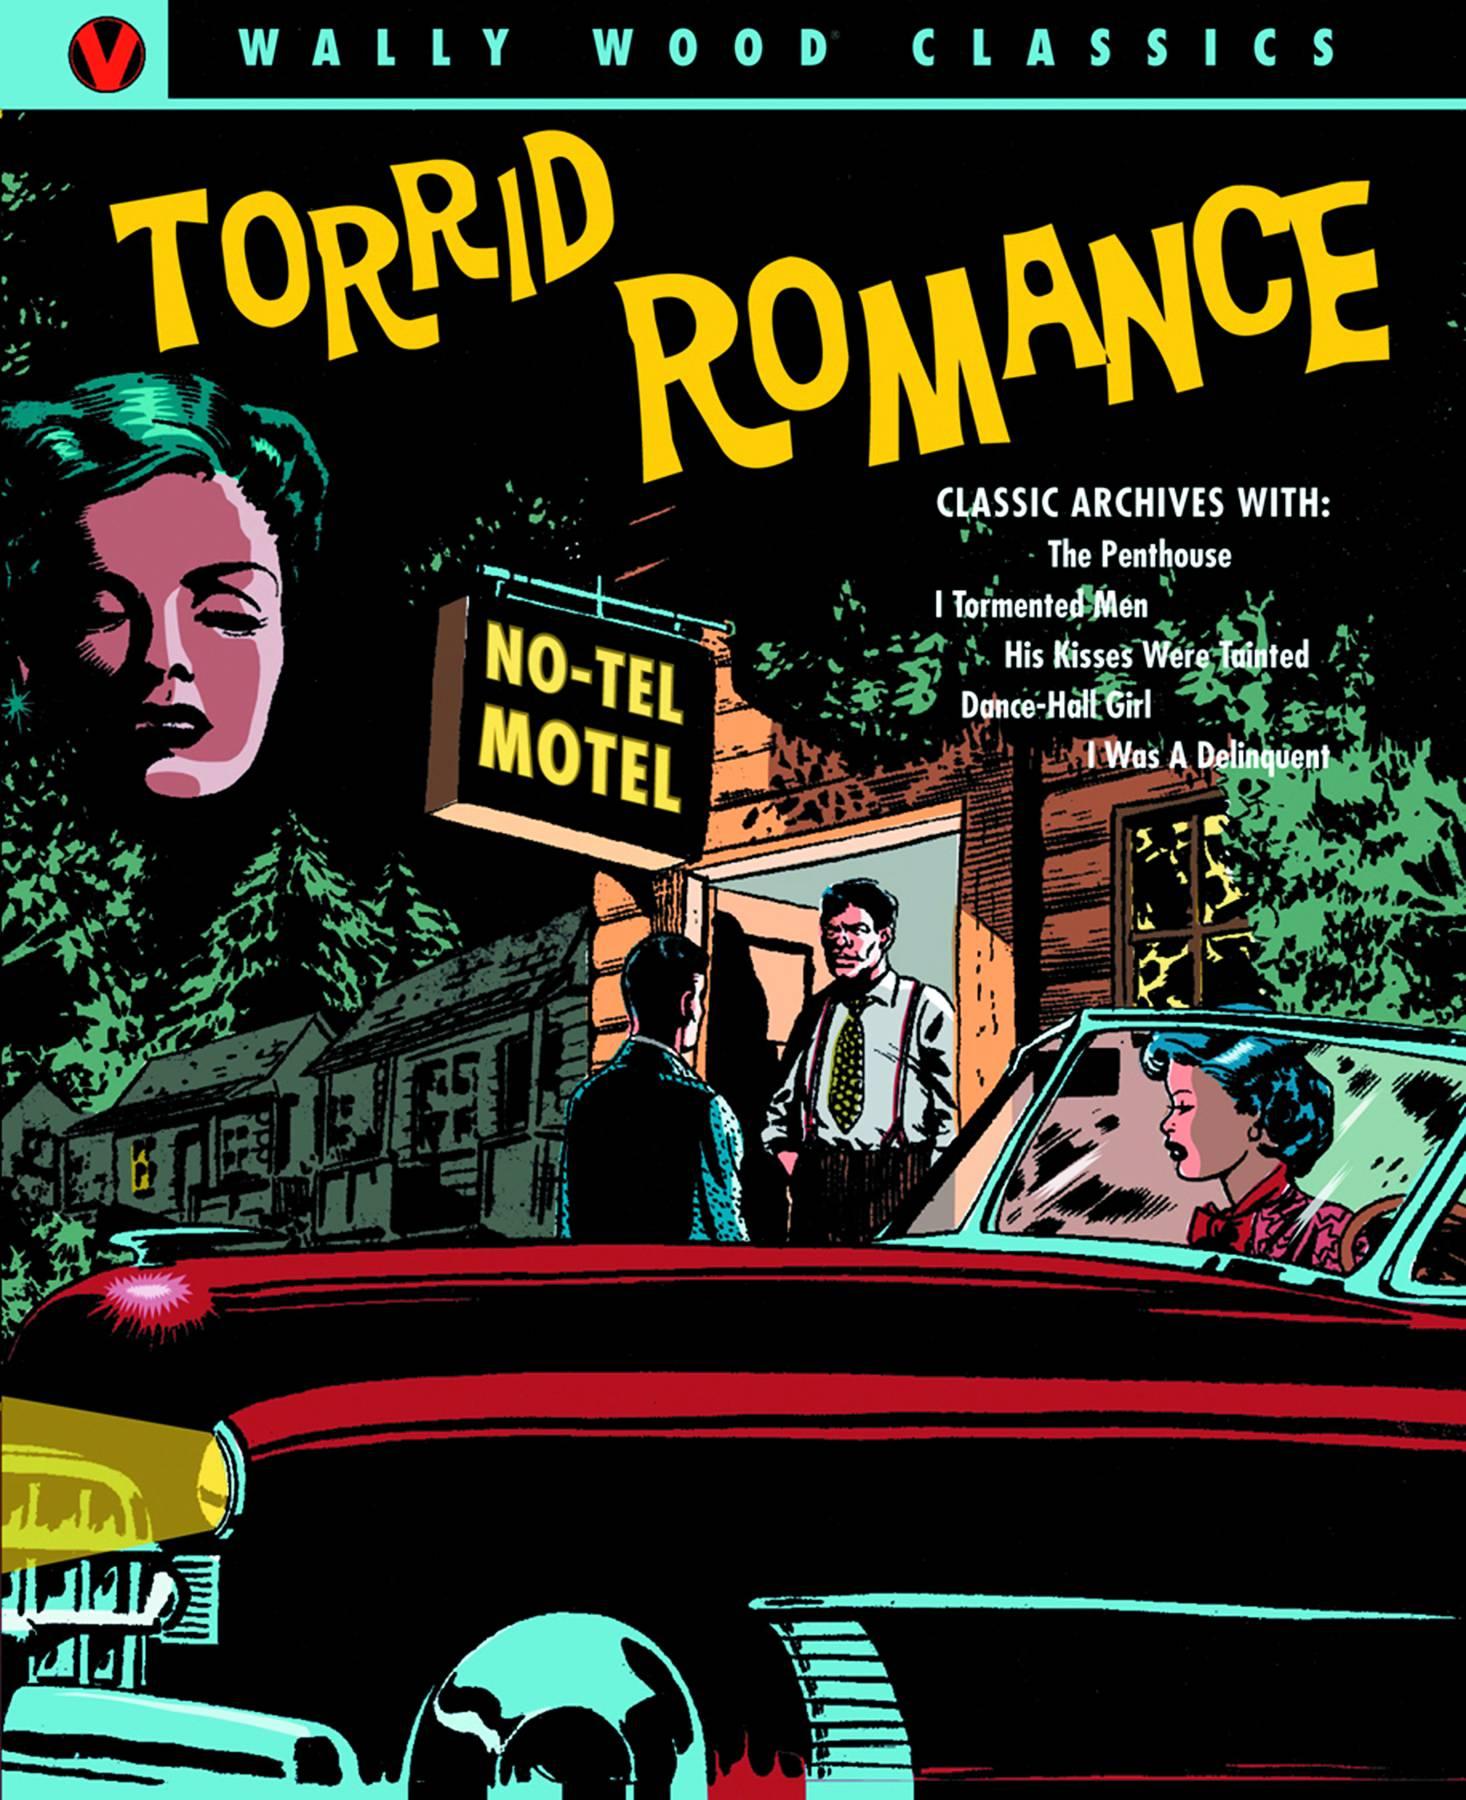 Wally Wood: Torrid Romances